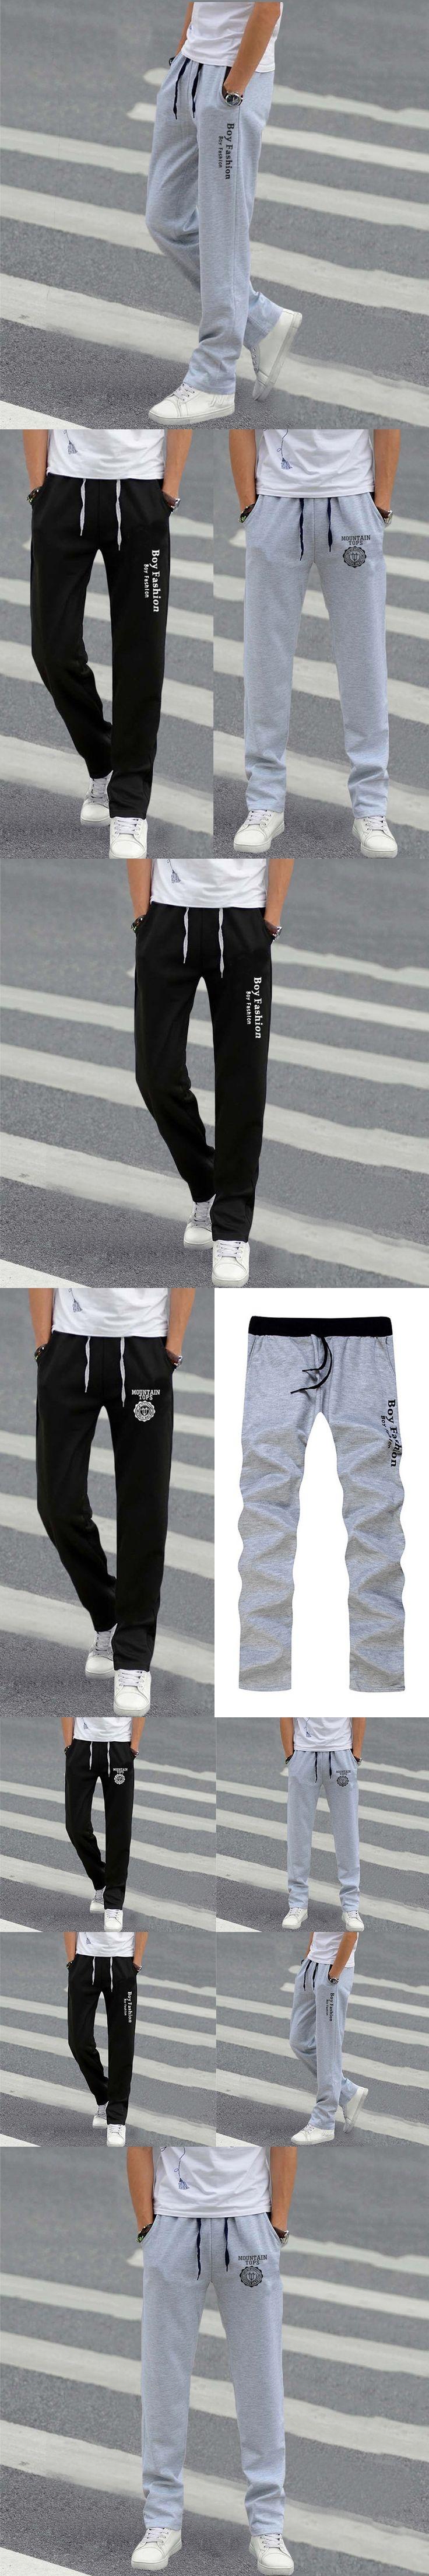 2017 Summer Street Fashion Men Elastic Waist Pants Men's All-match Loose Solid Soft Cotton Casual Straight Plus Size Long Pants